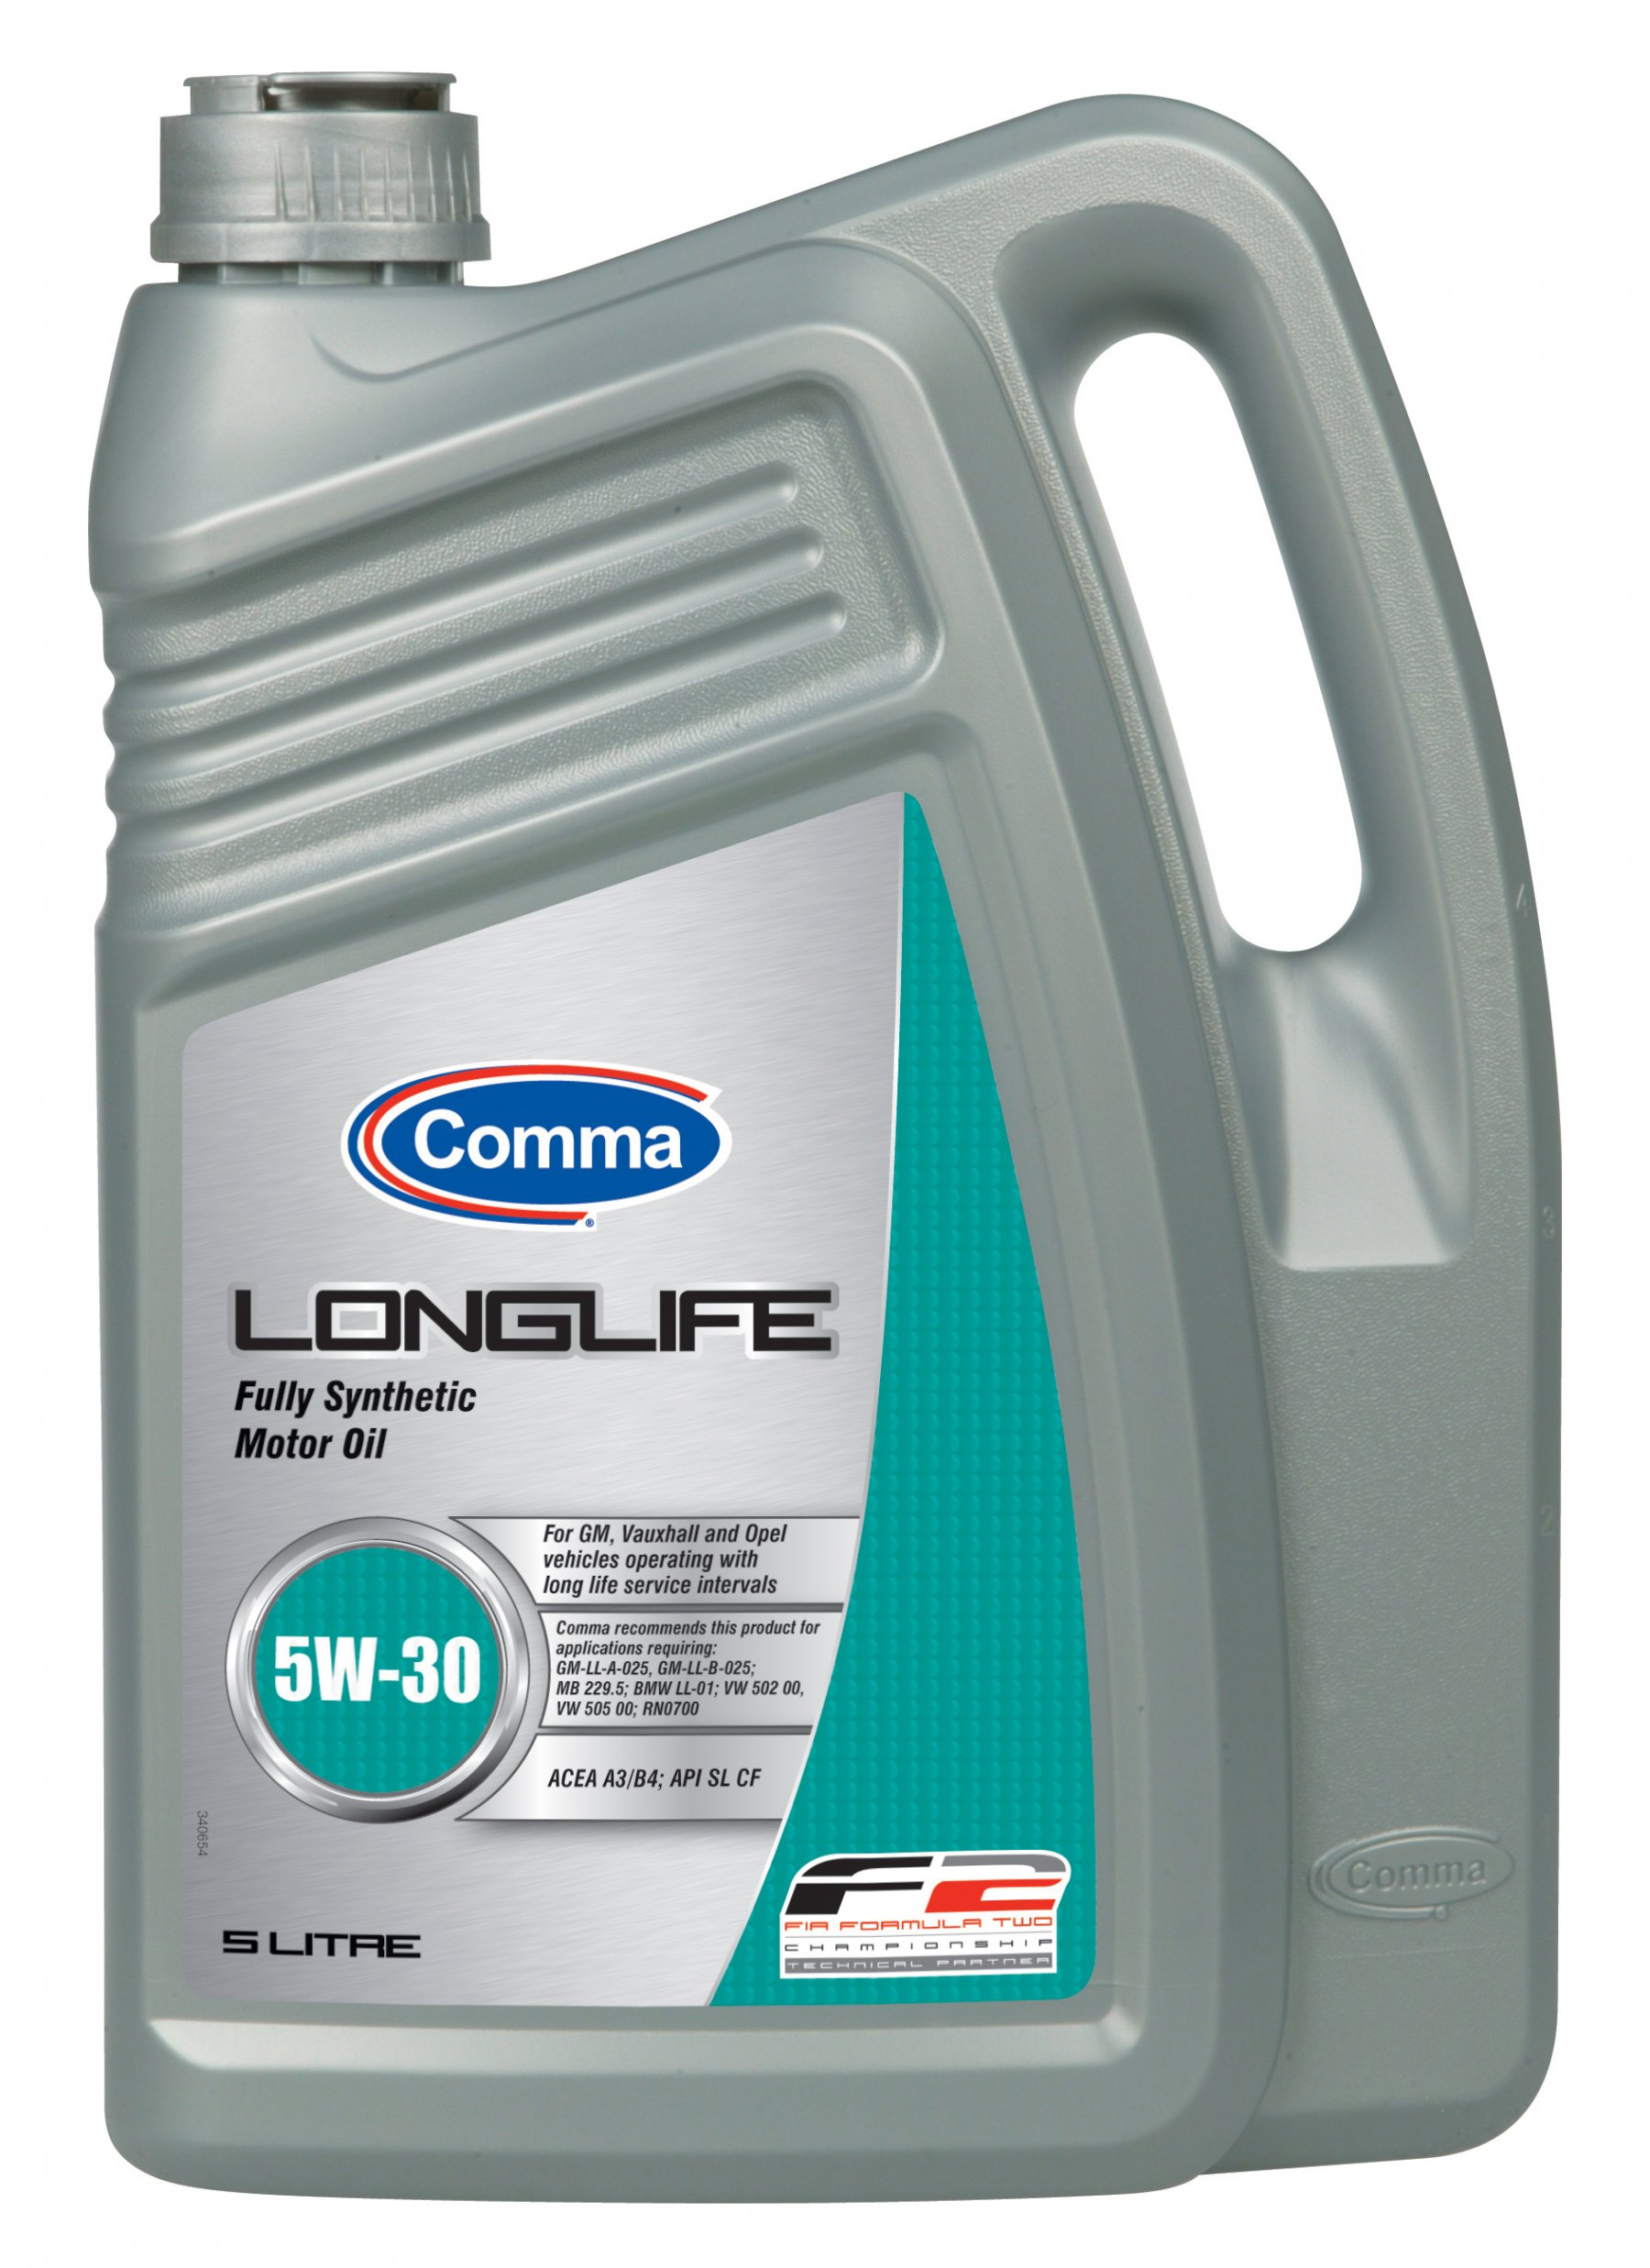 Comma Long Life 5w-30 4 л